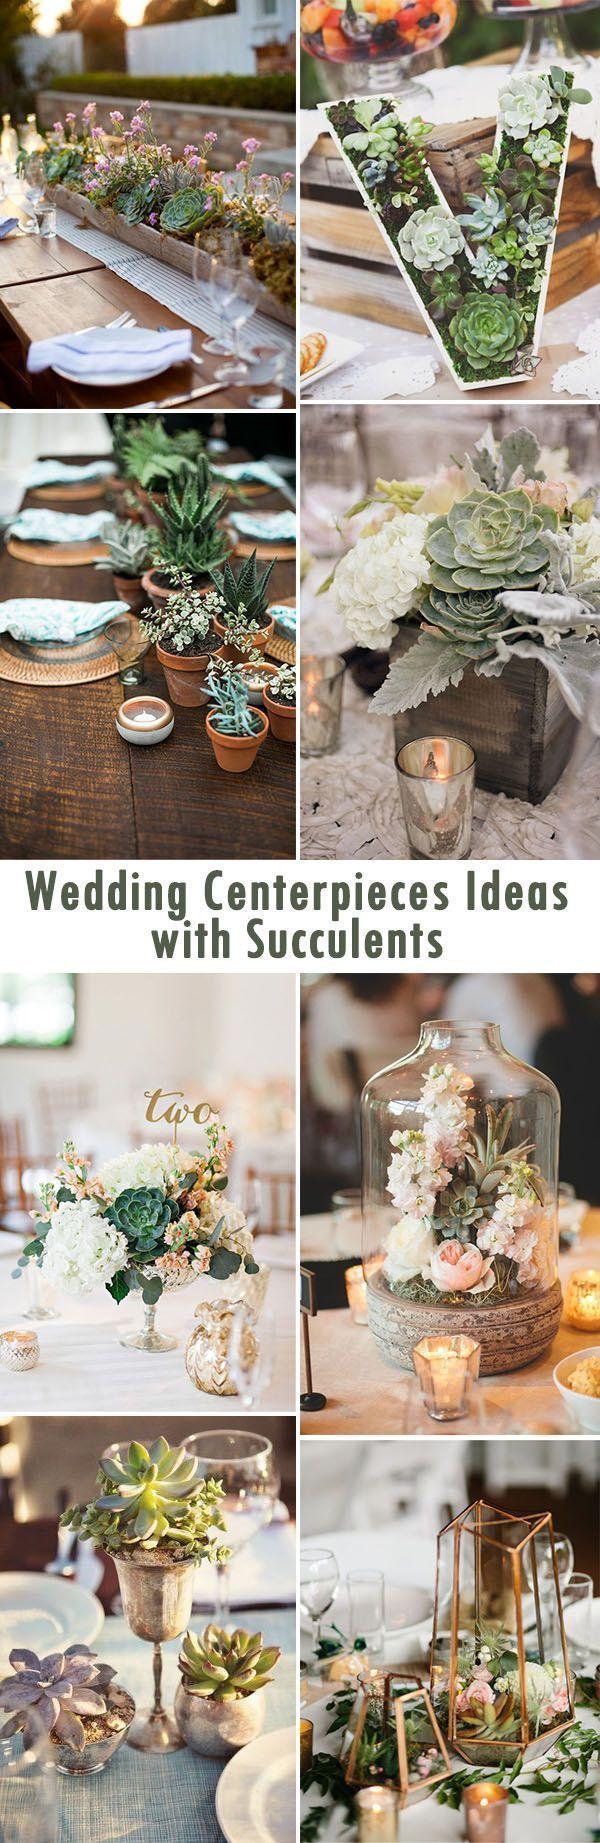 Diy wedding centerpieces ideas with succulents wedding flowers